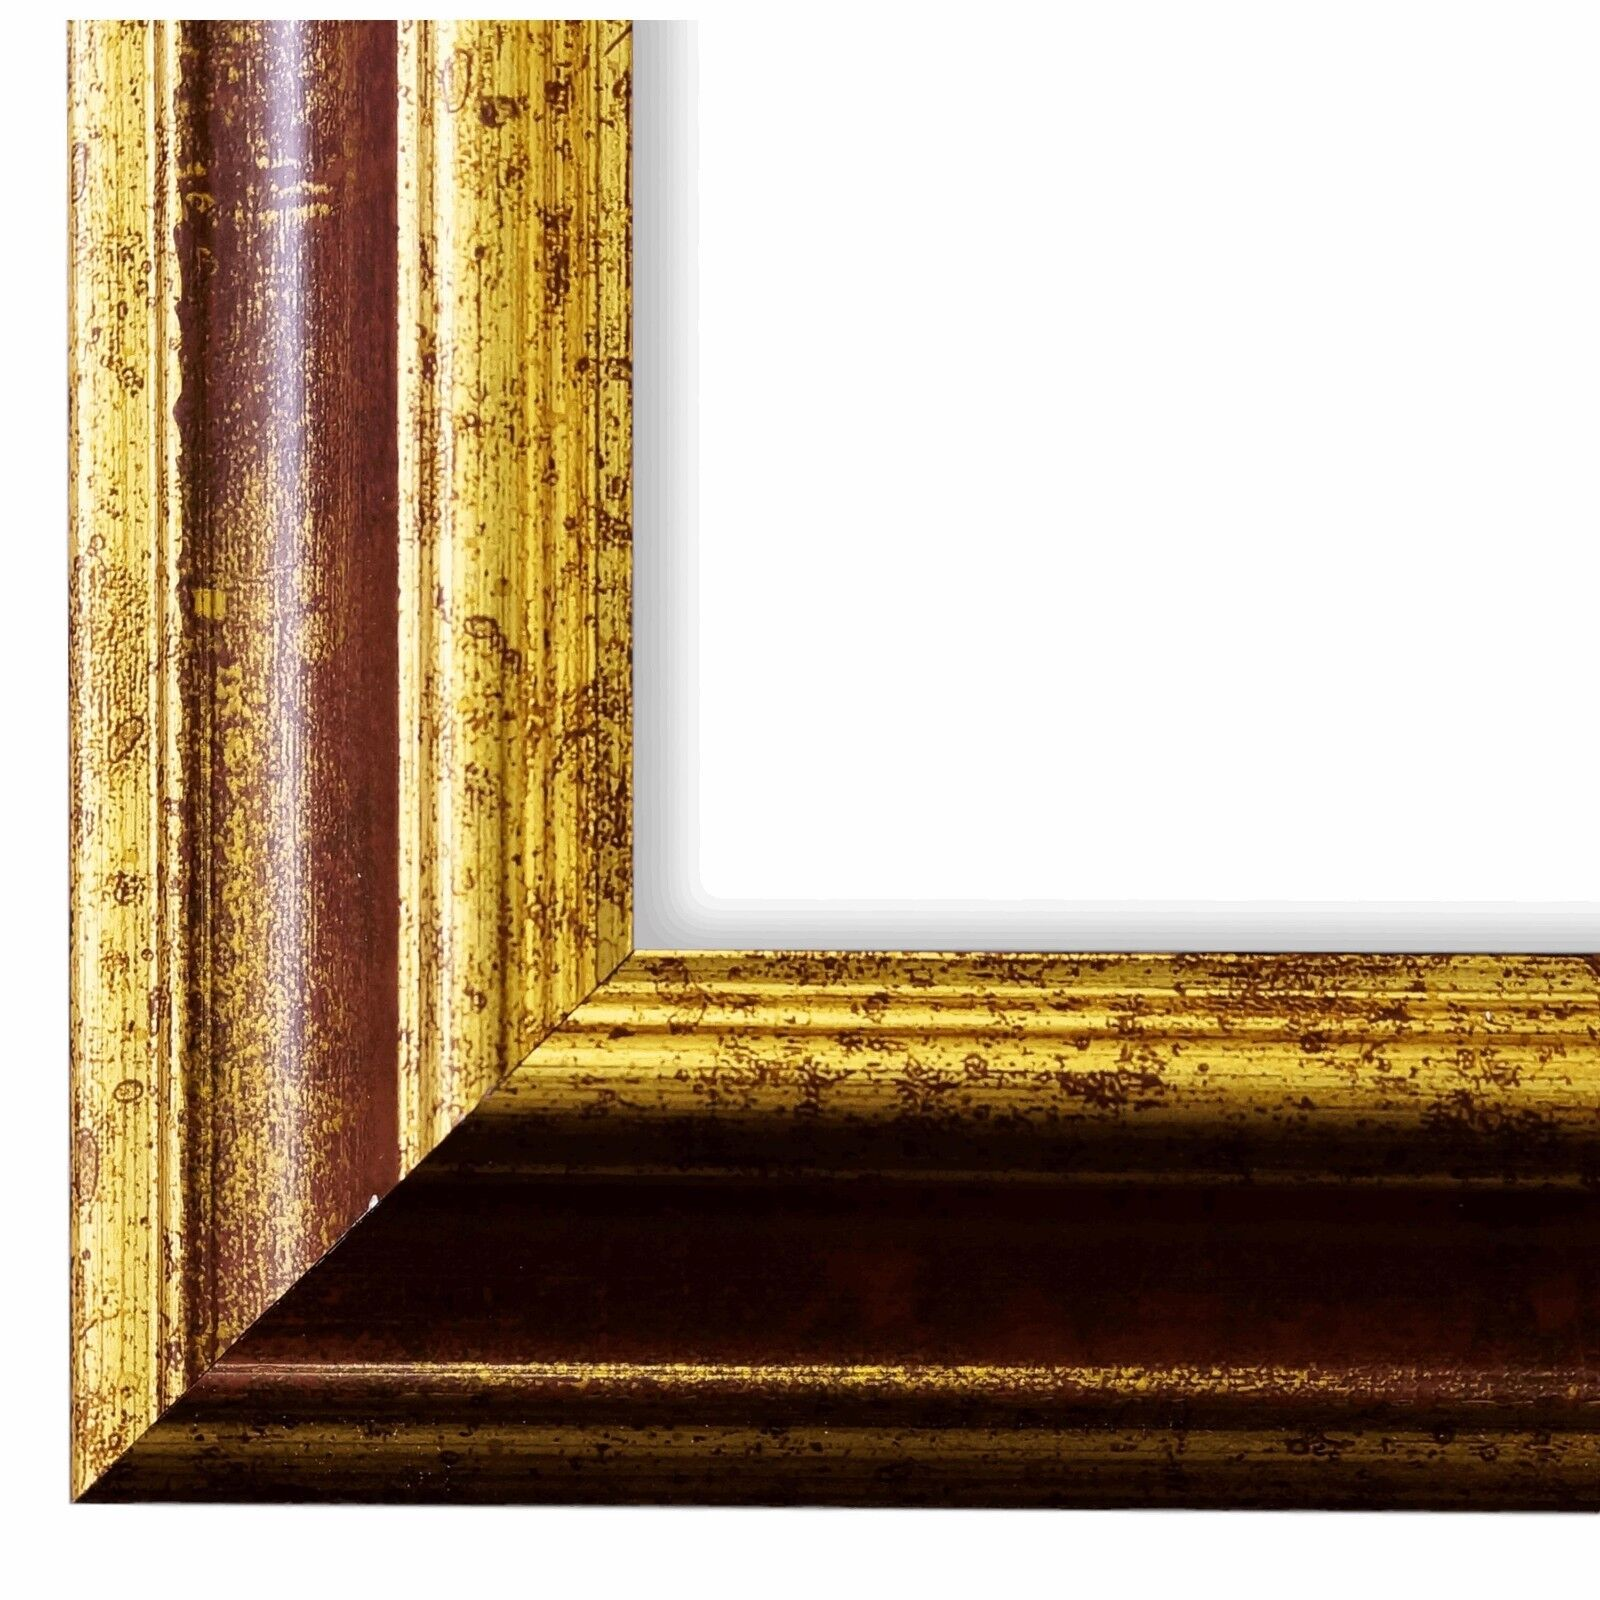 Bilderrahmen Rot Gold Antik Vintage Retro Bari 4,4 - NEU alle Größen